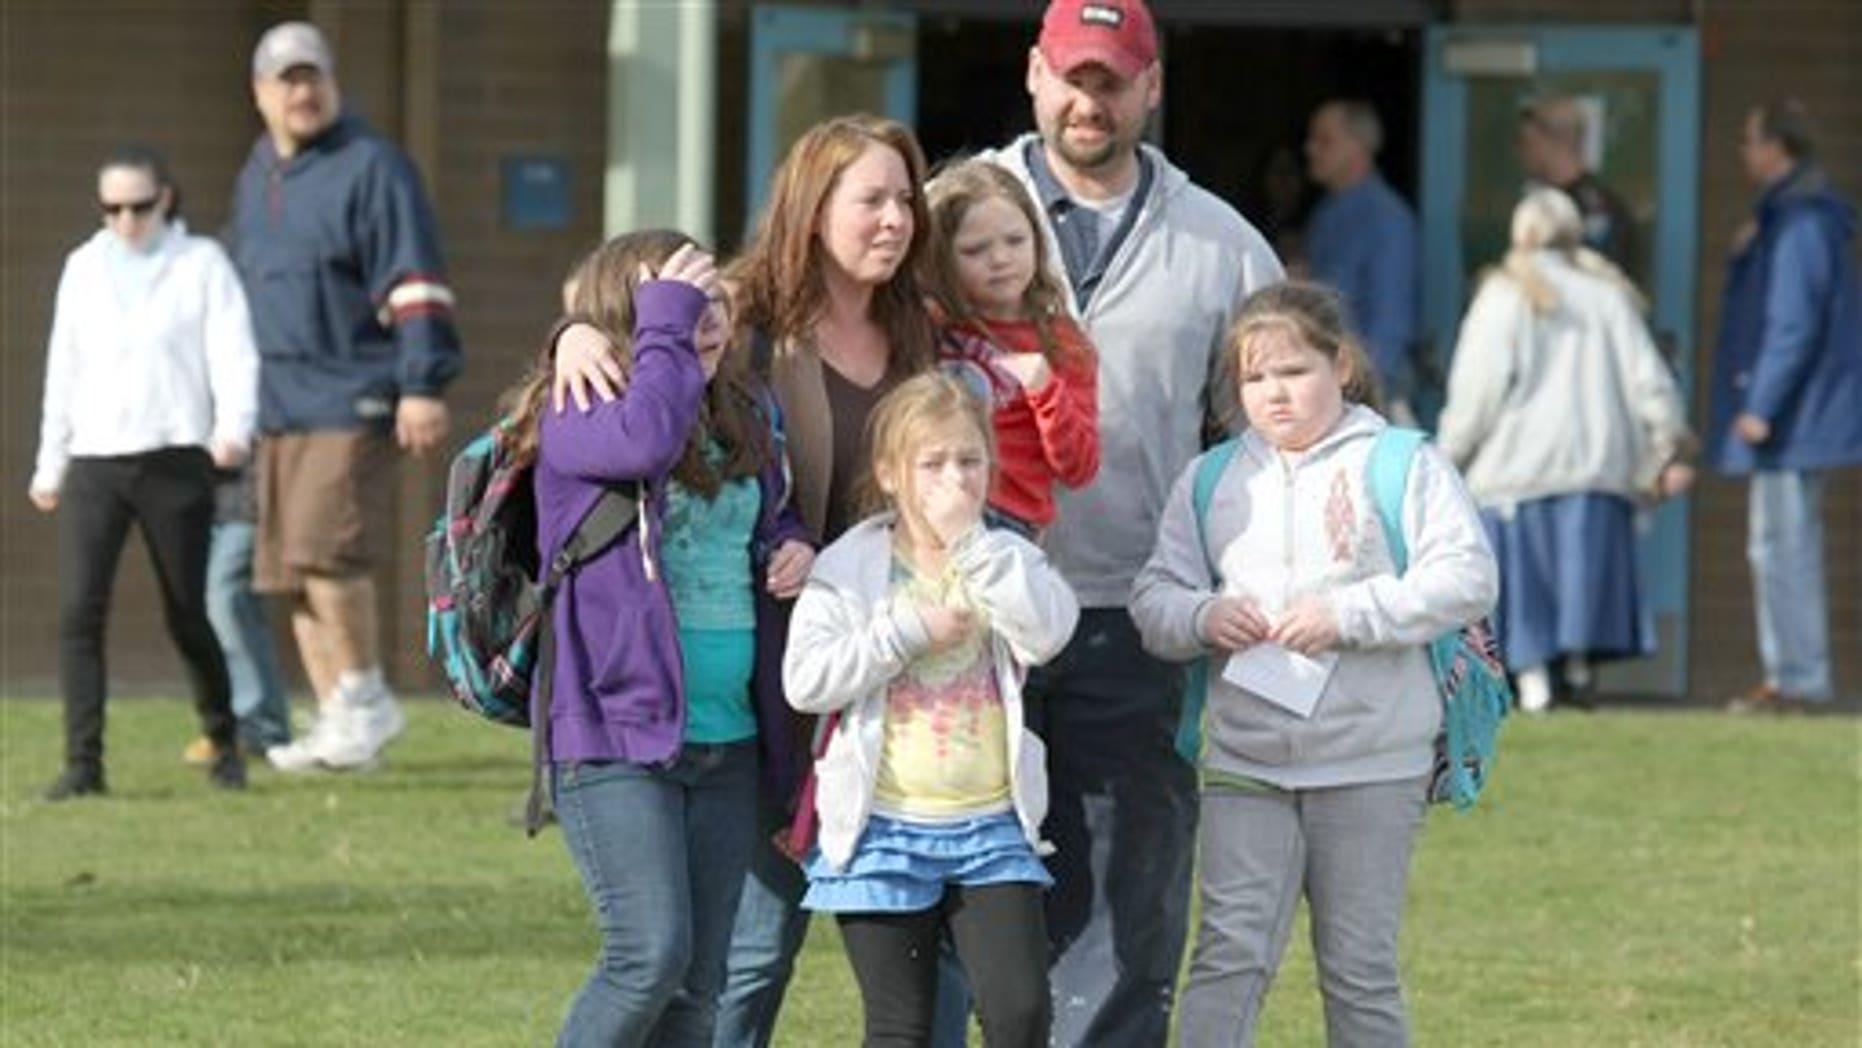 Feb. 22: Parents and children leave Armin Jahr Elementary School in Bremerton, Wash.